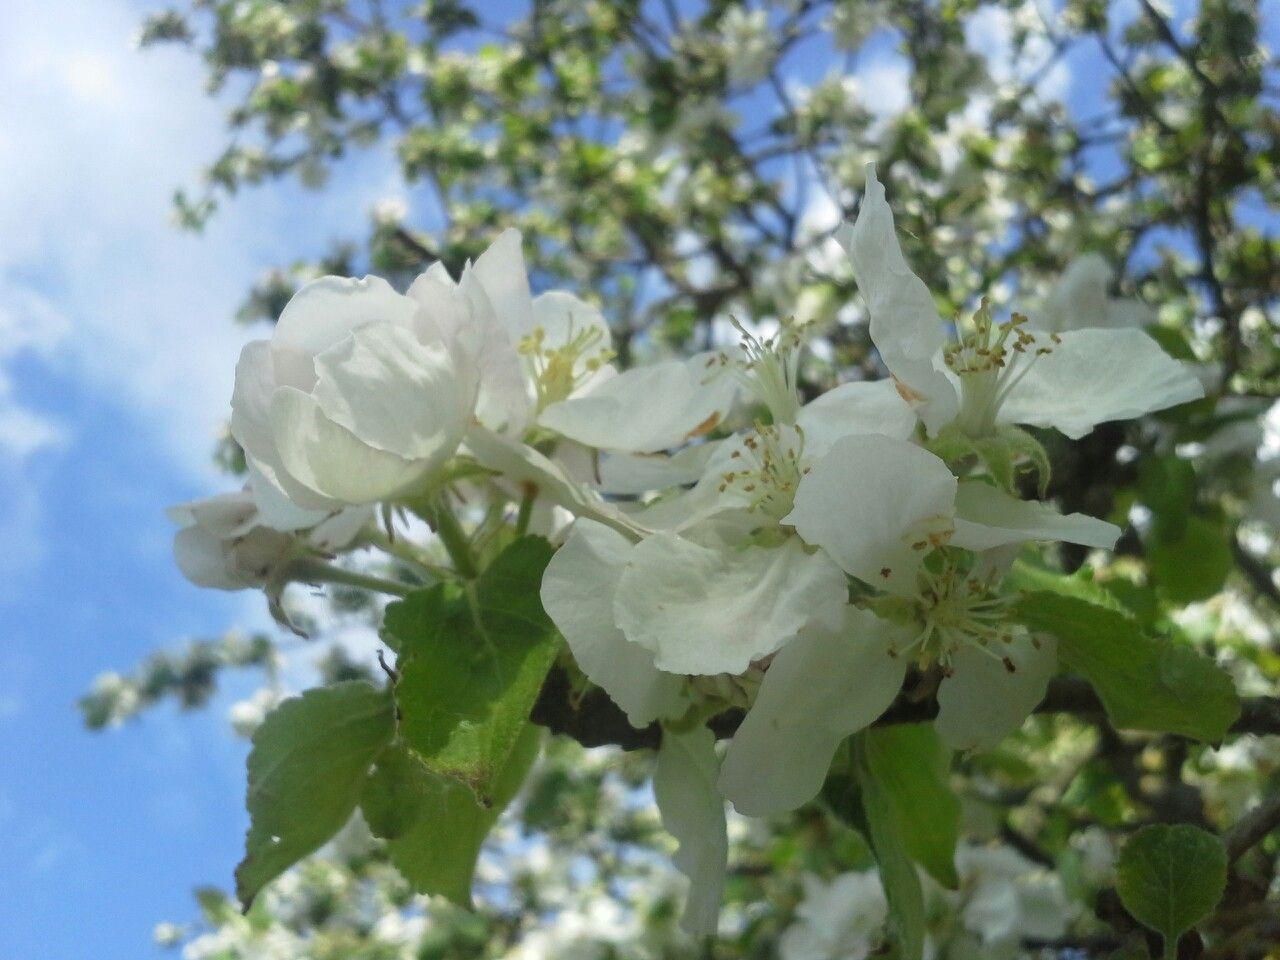 Apfelbaum in voller Blüte  #apfelblüte #Frühling